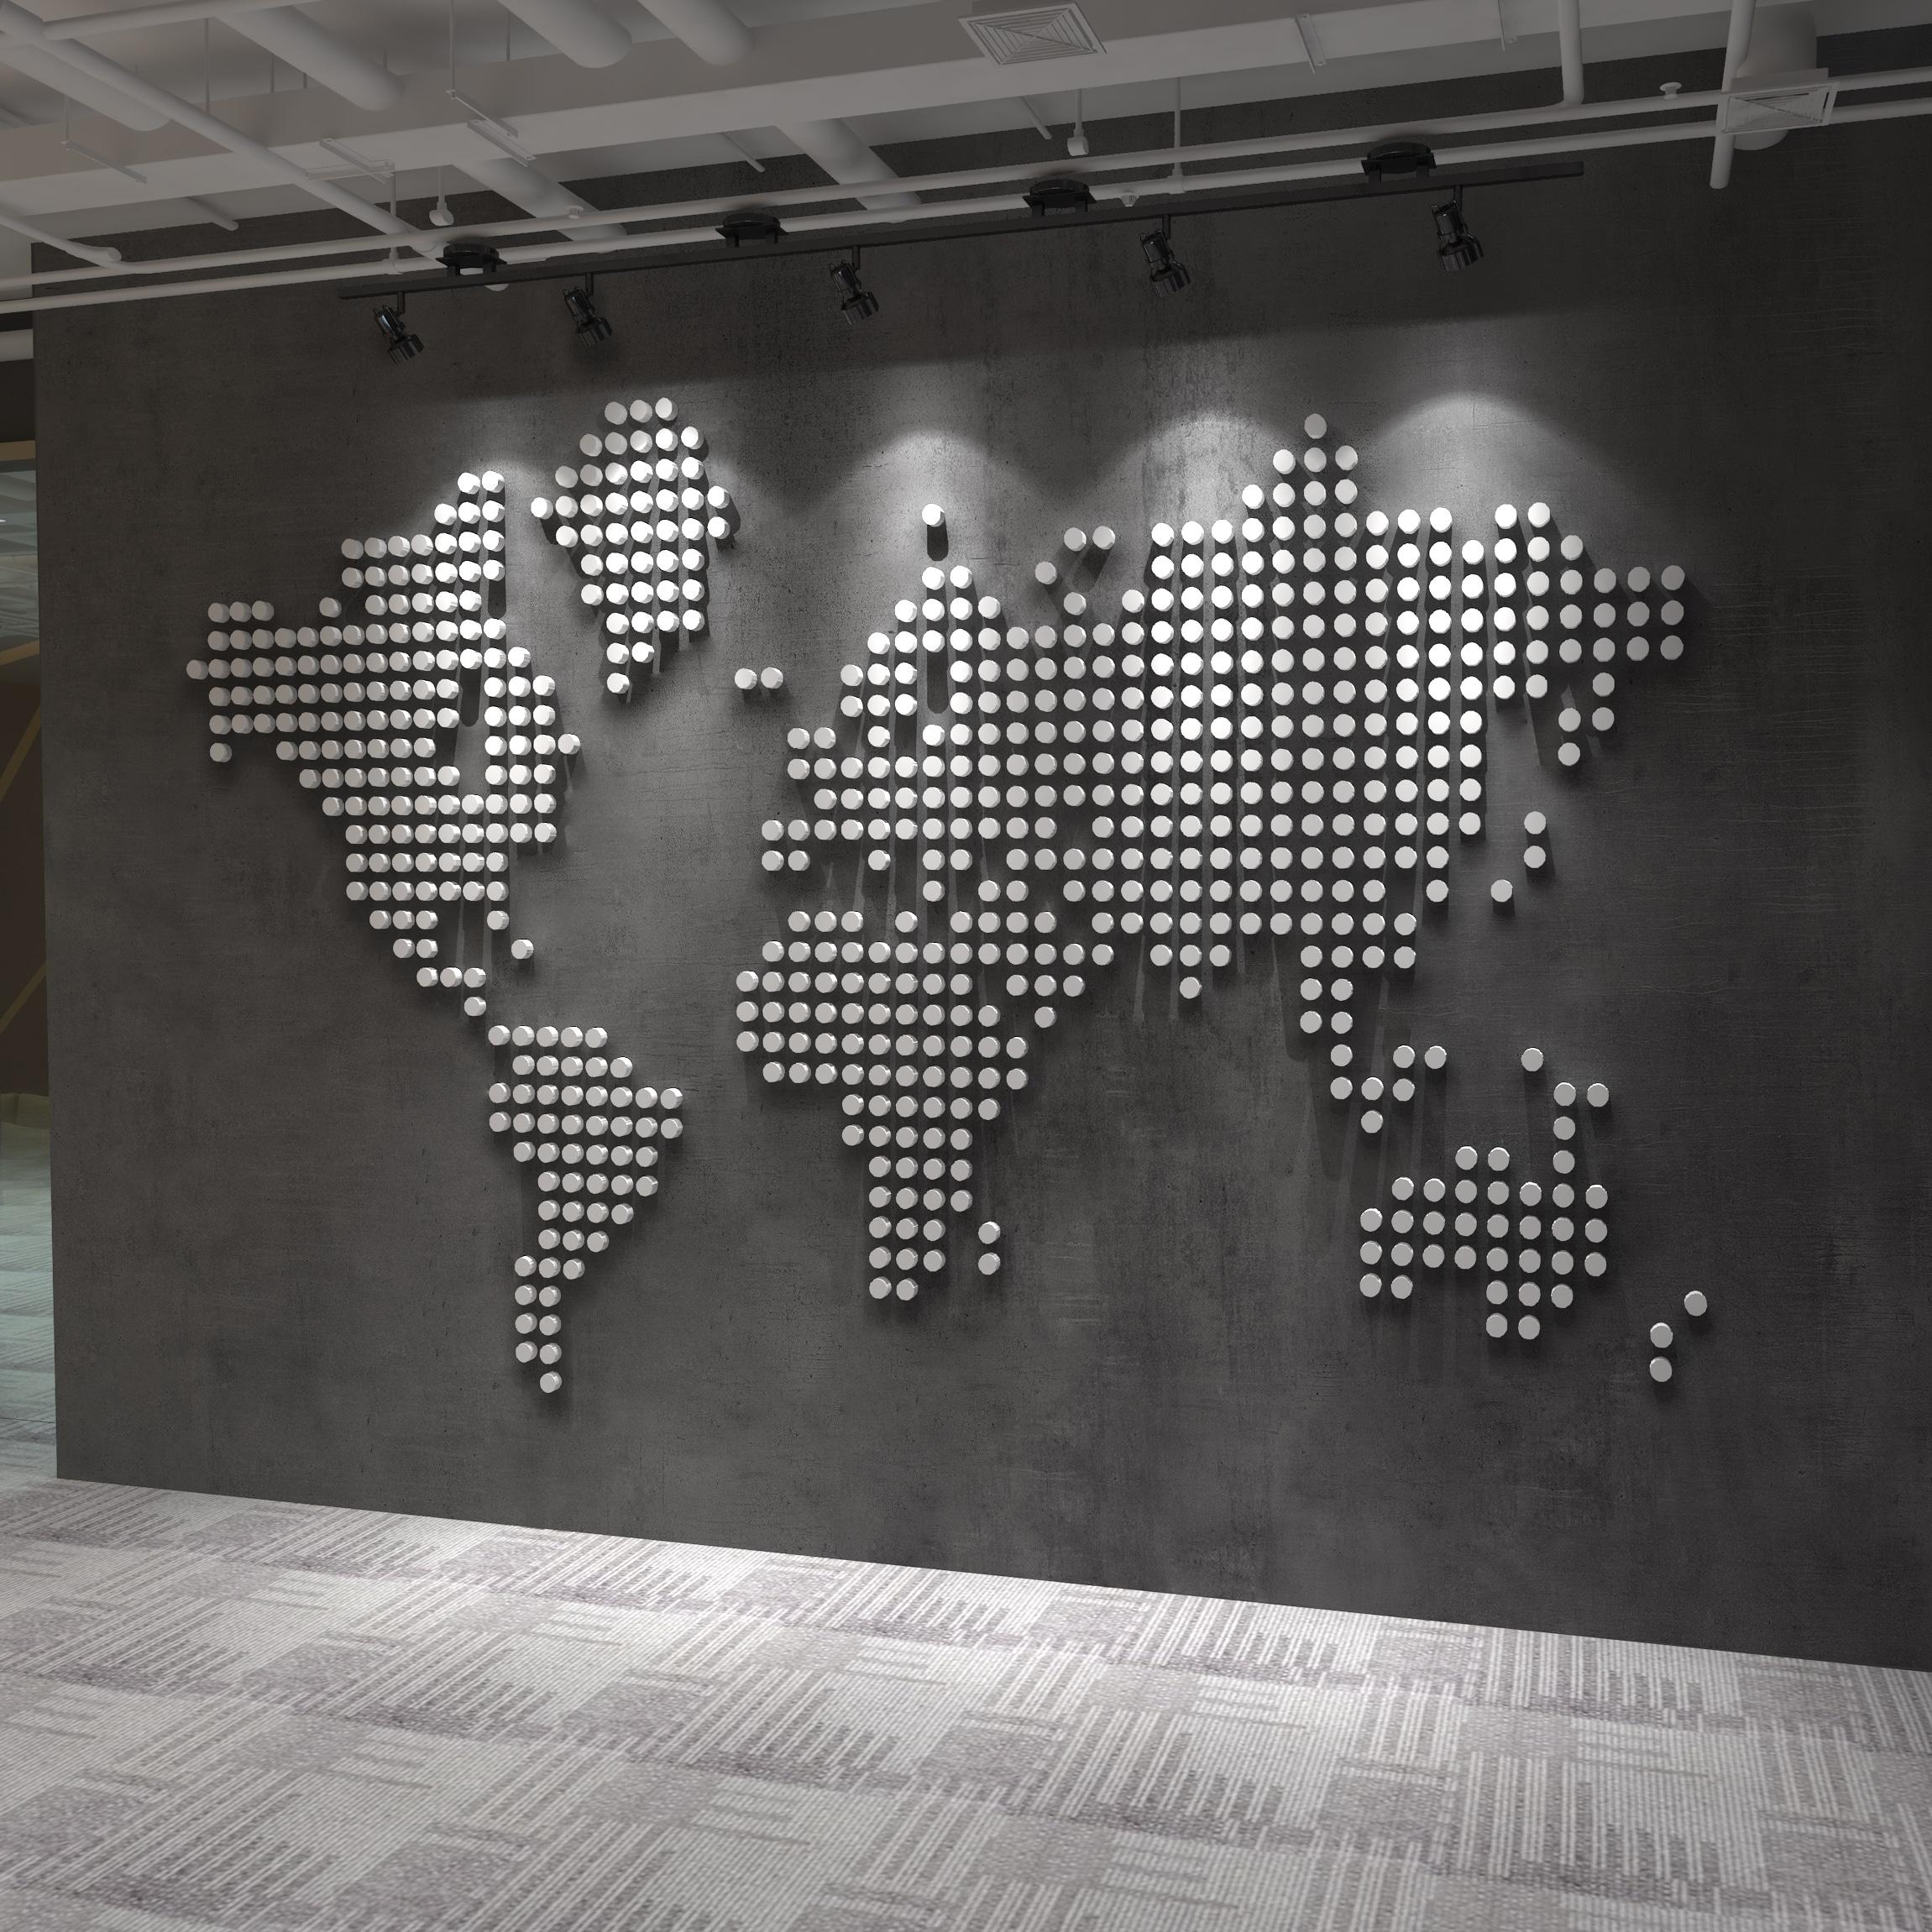 World Map 3D Dots Wall Decor on